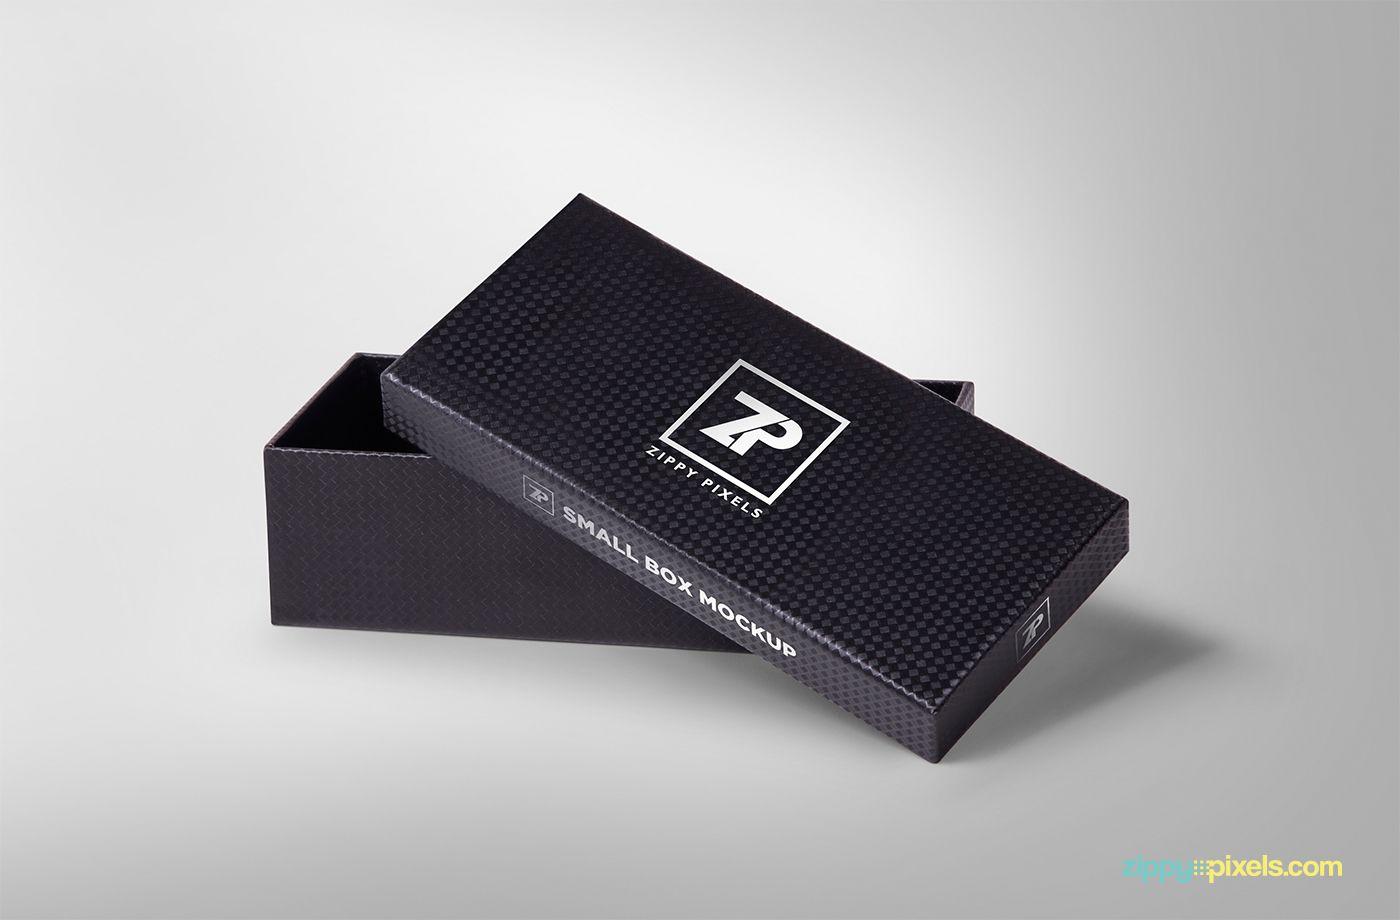 Download 2 Free Gift Box Mockups On Behance Box Mockup Free Packaging Mockup Mockup Free Psd